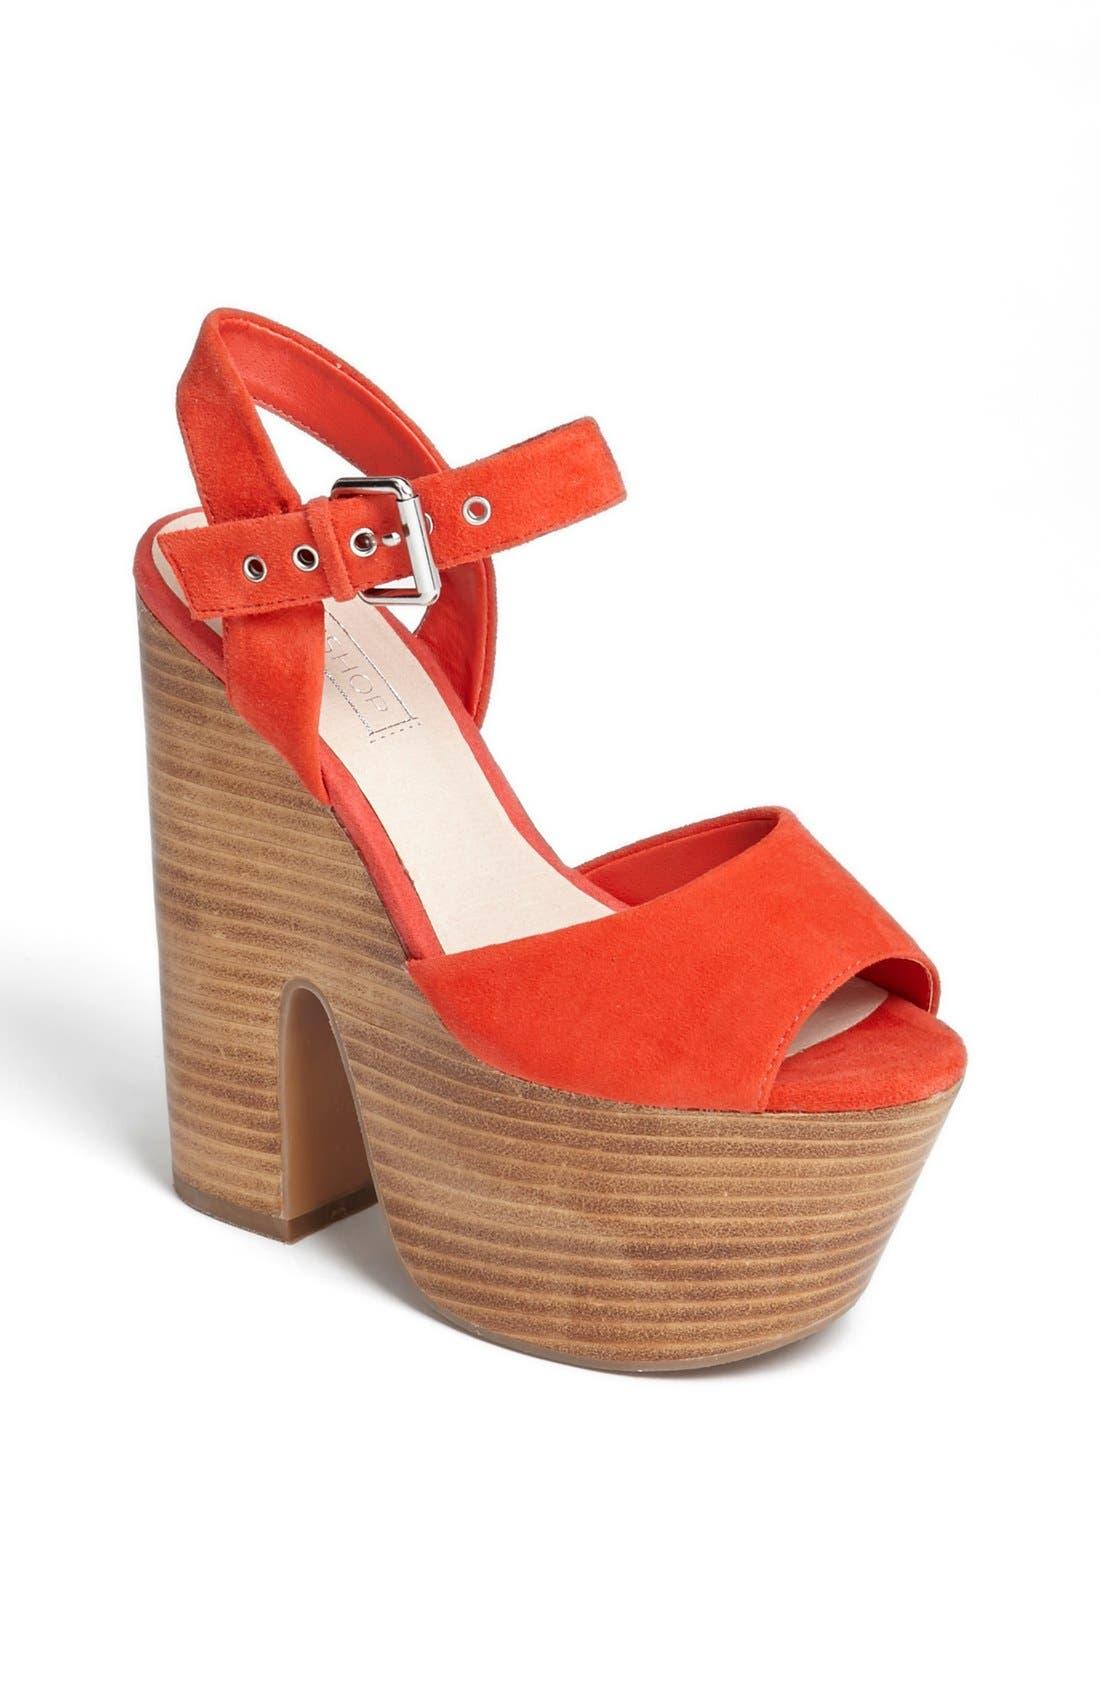 Alternate Image 1 Selected - Topshop 'Lassie' Platform Sandal